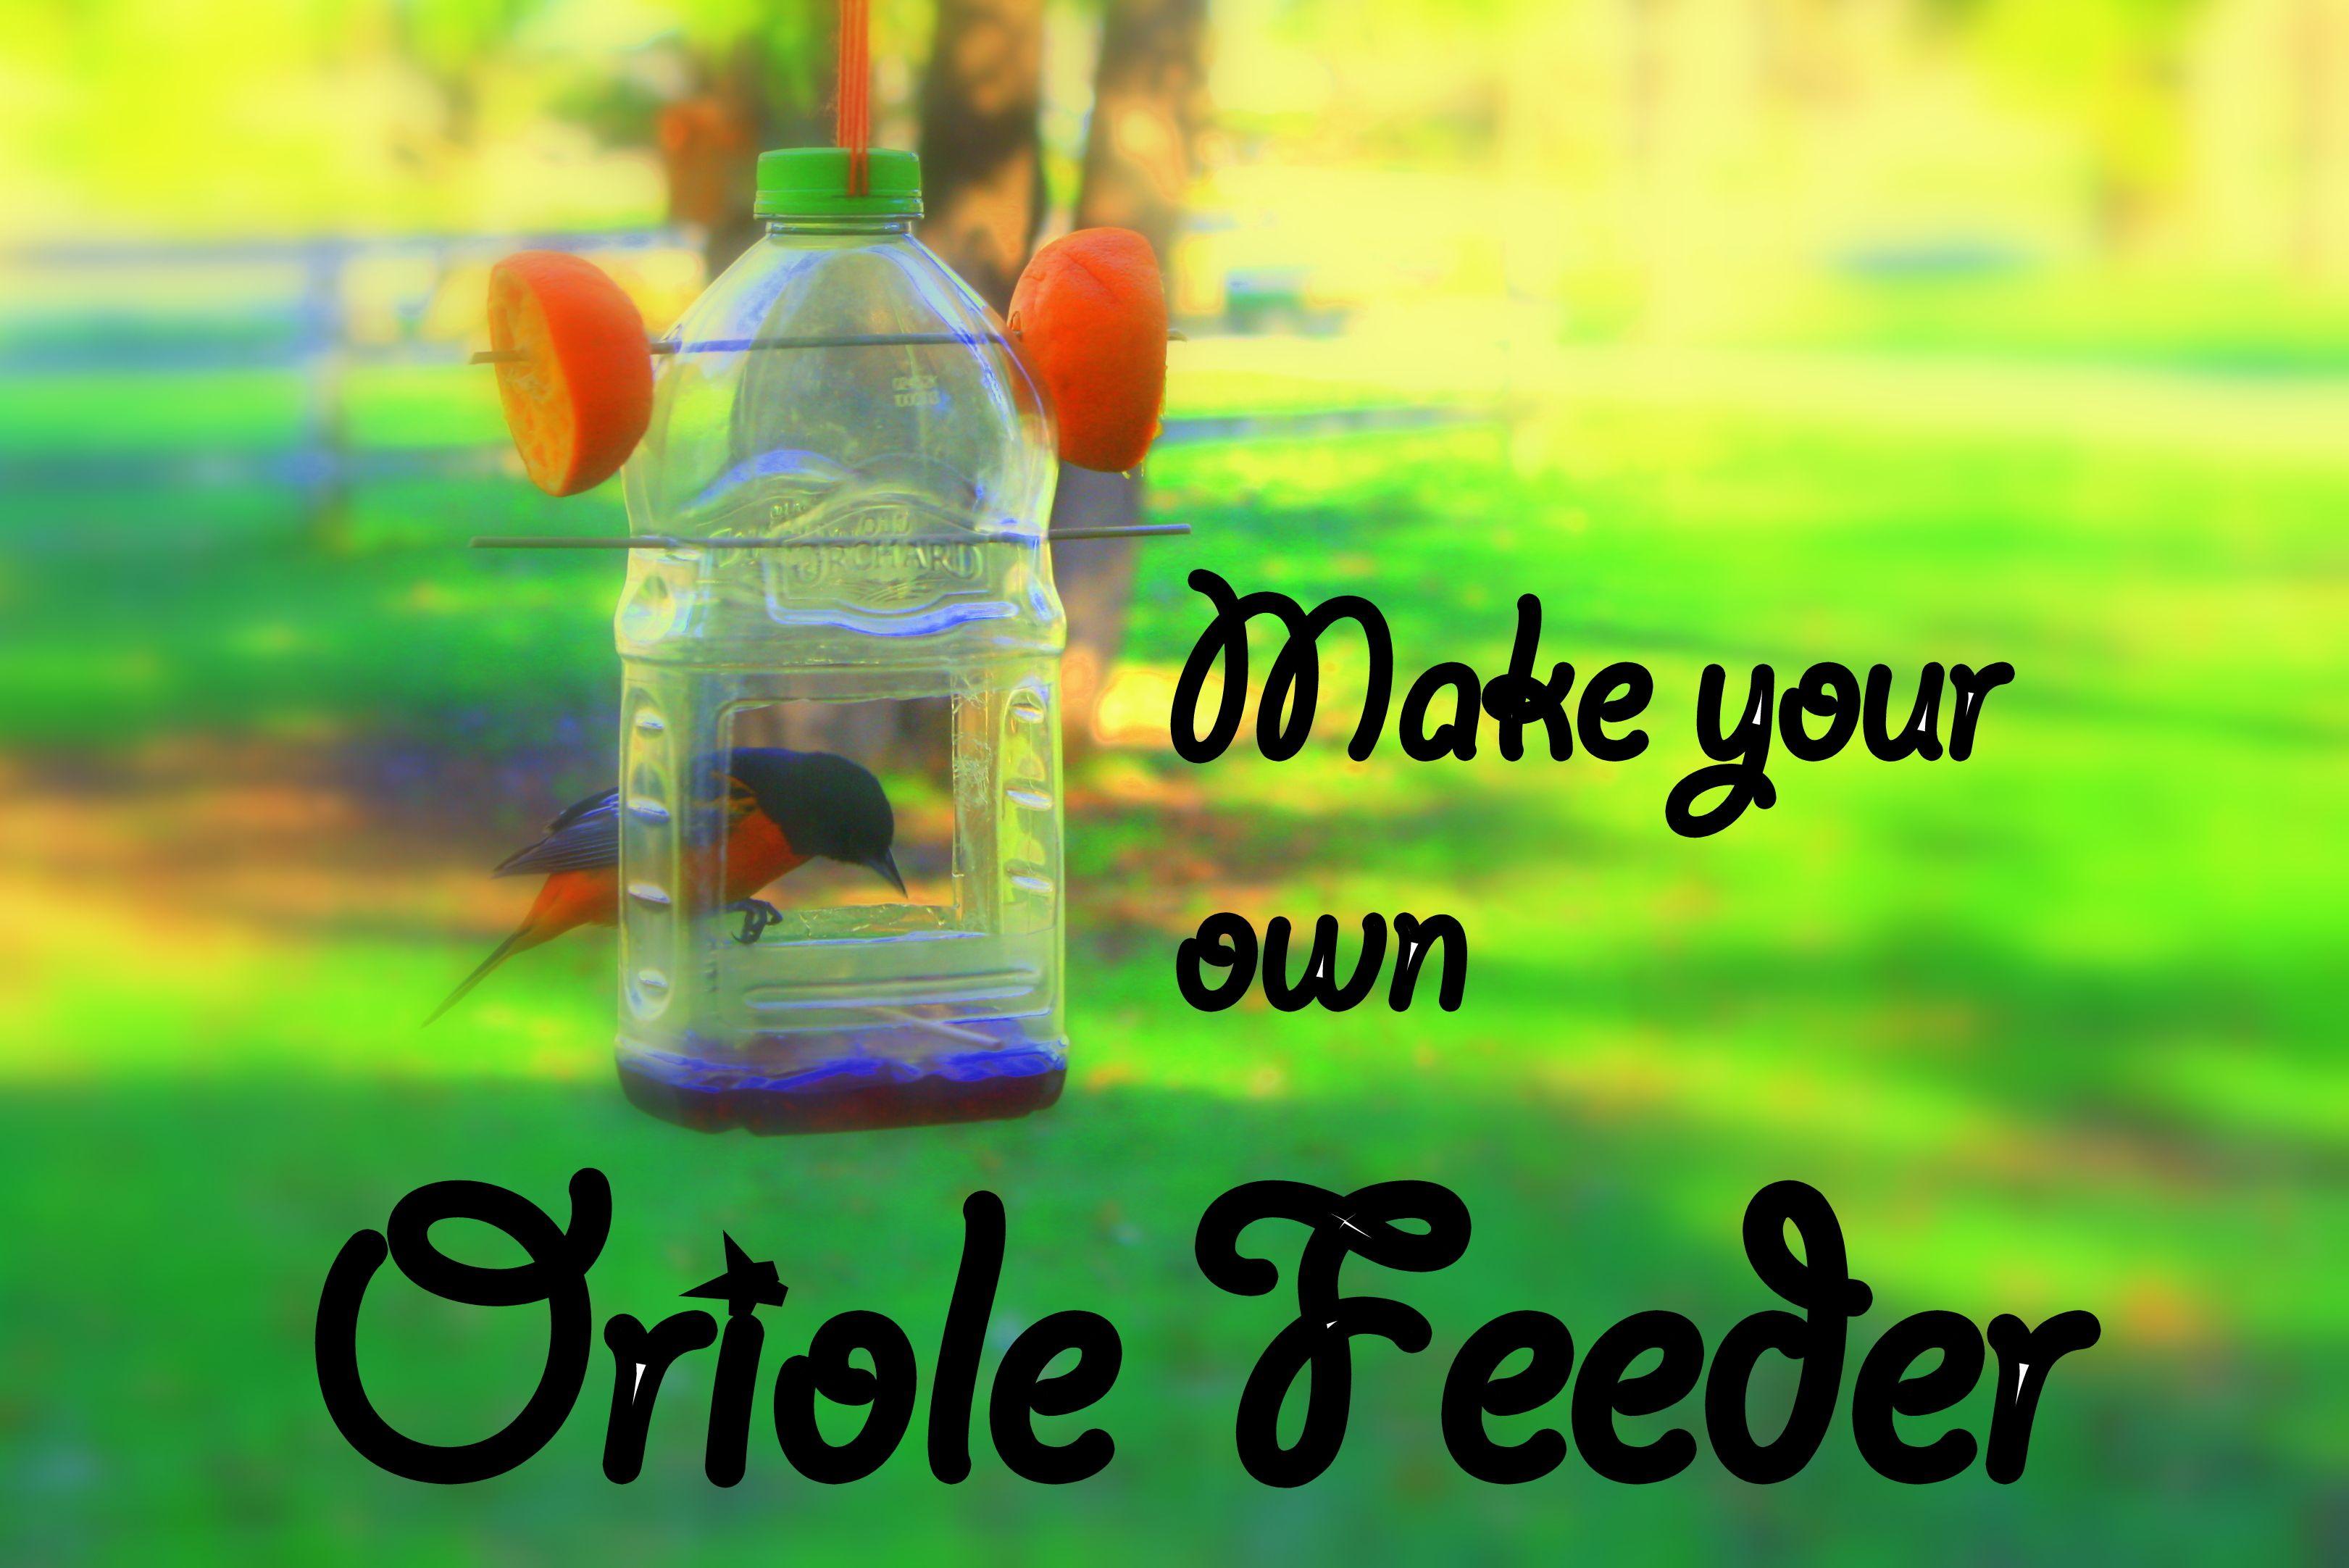 dp feeder amazon com outdoor perky jelly oriole wild pet garden bird best